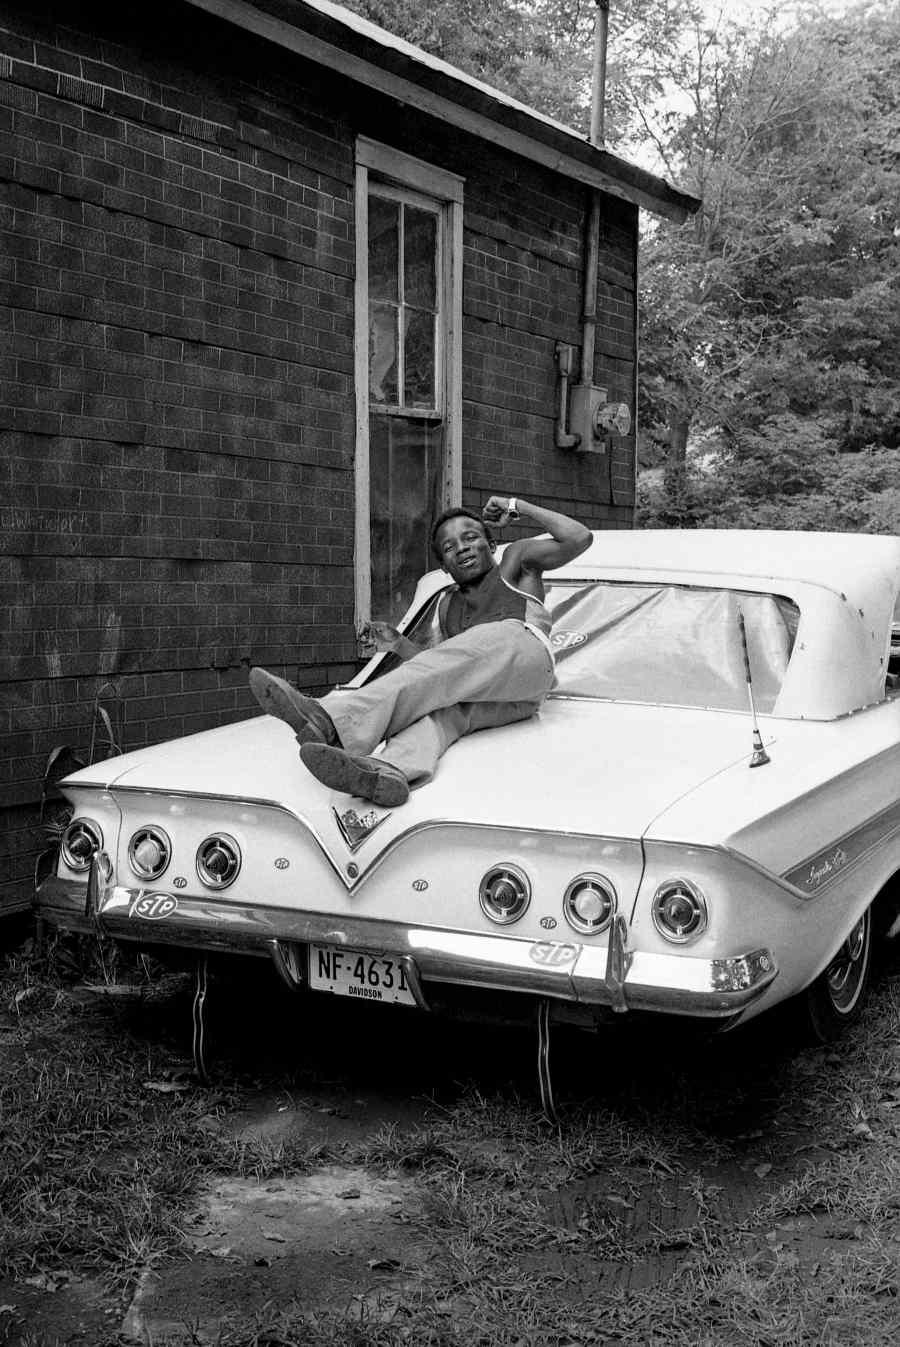 Will on Chevy 1971 Nashville